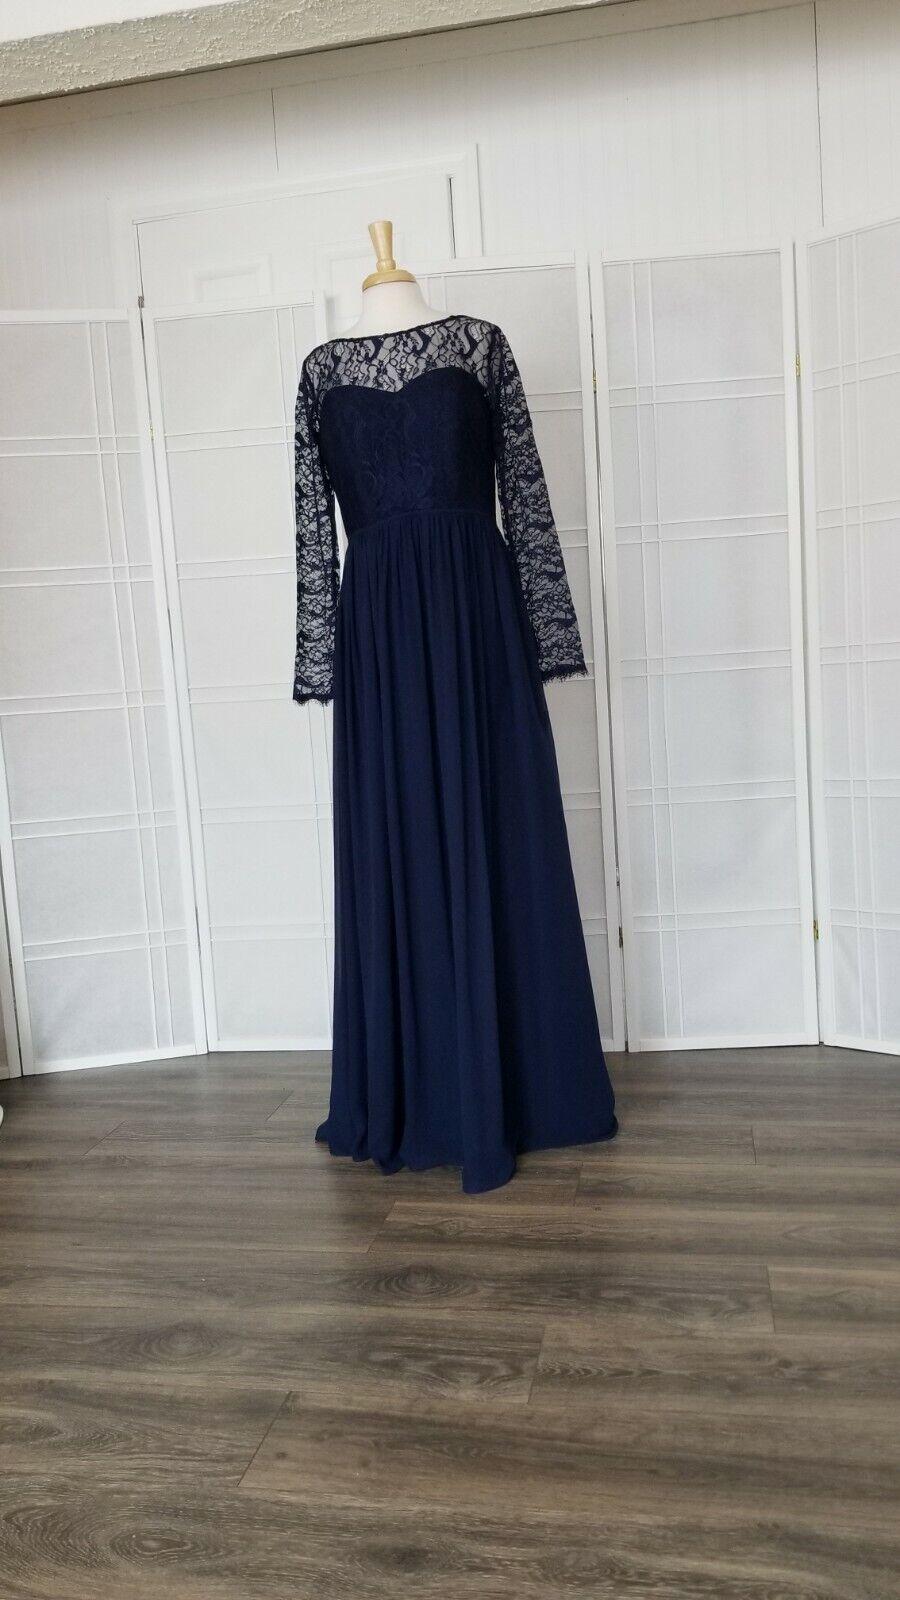 dress size 14 color navy/indigo designer Hayley Paige